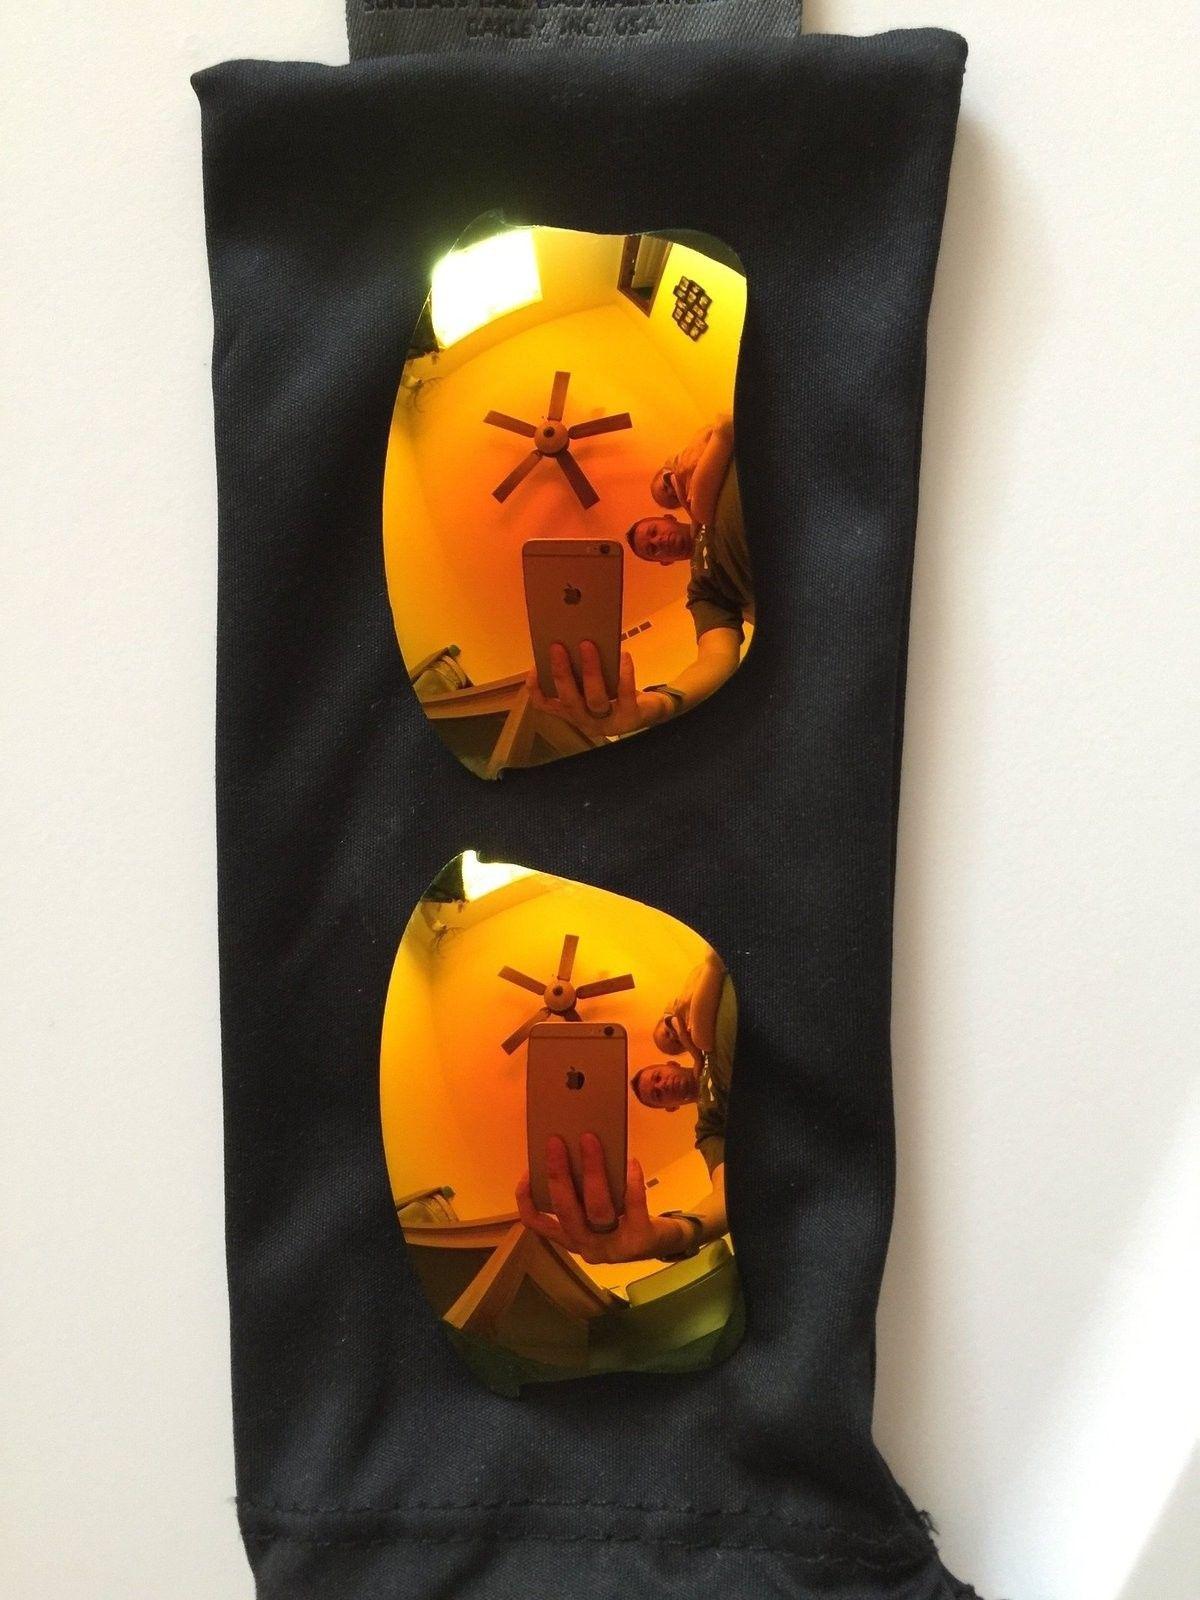 Flak 1.0 Fire Iridium Lenses - image.jpg